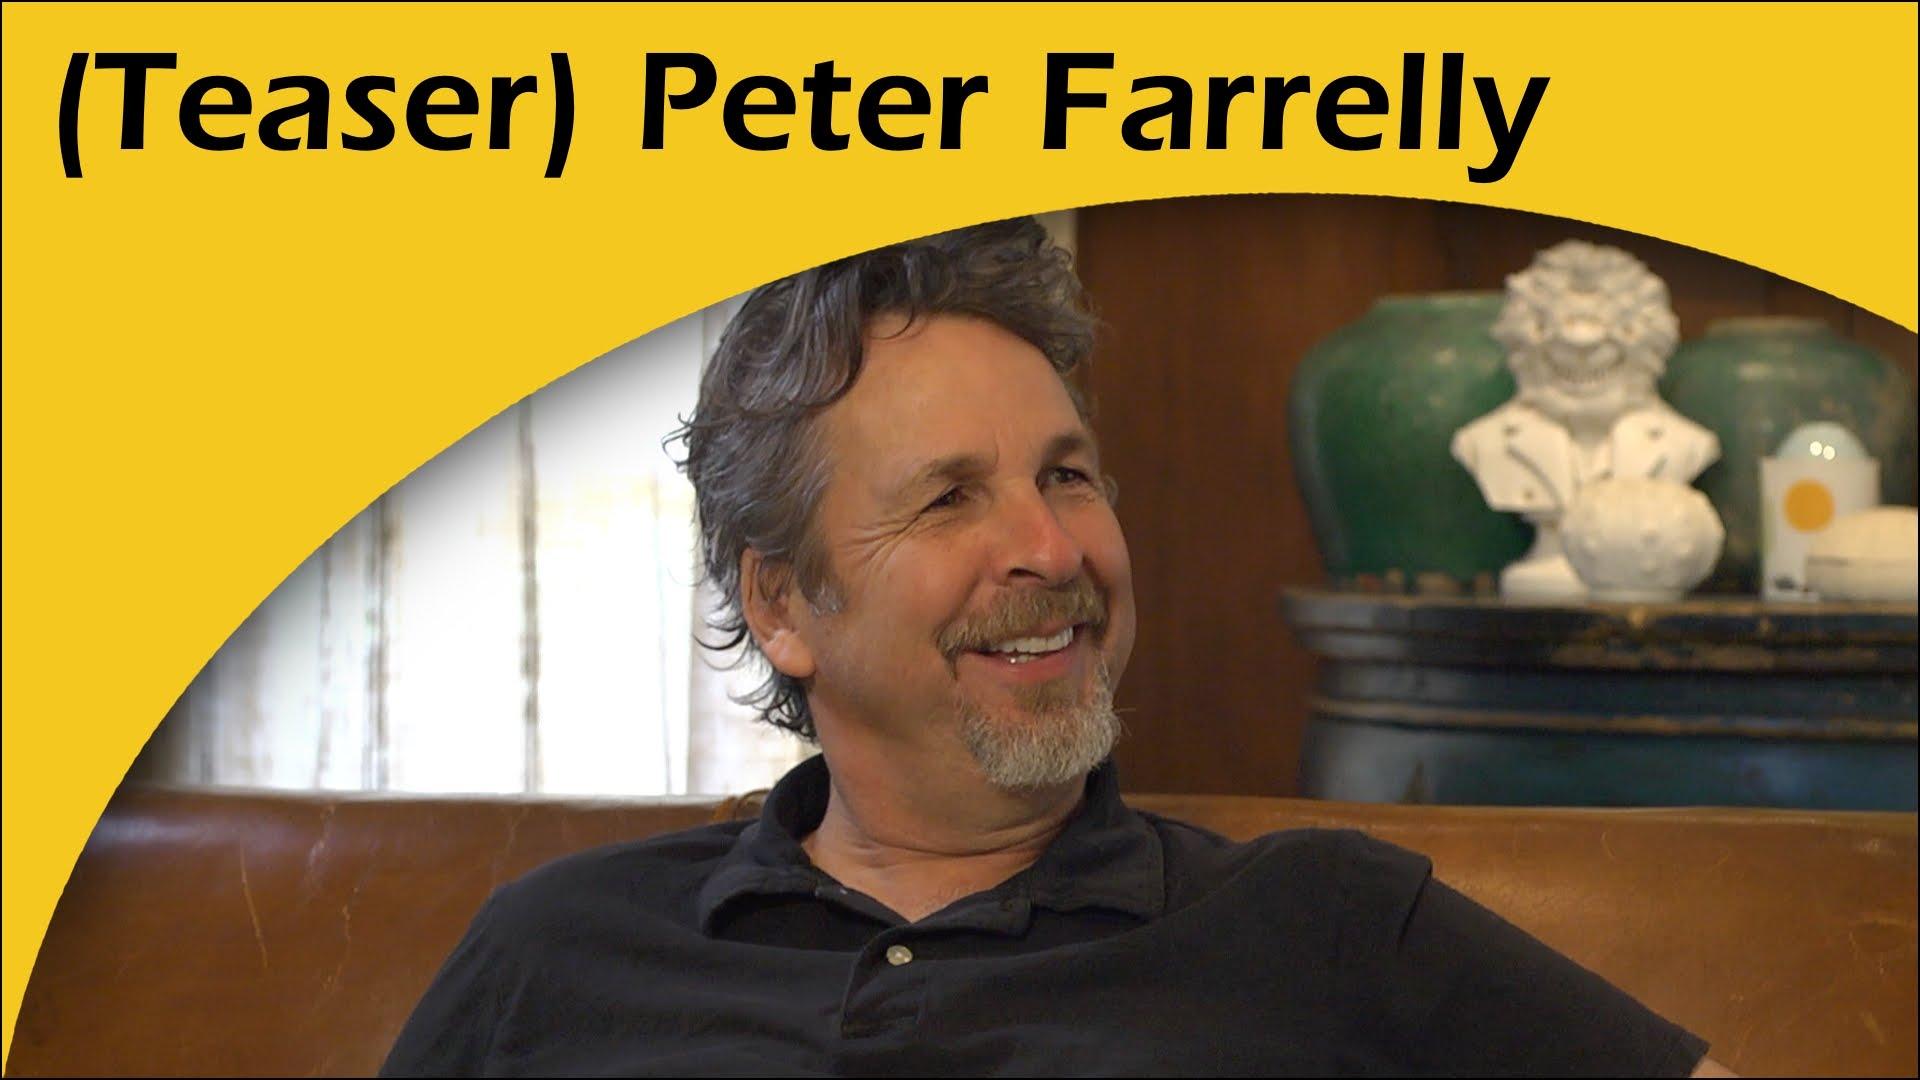 peter farrelly net worth